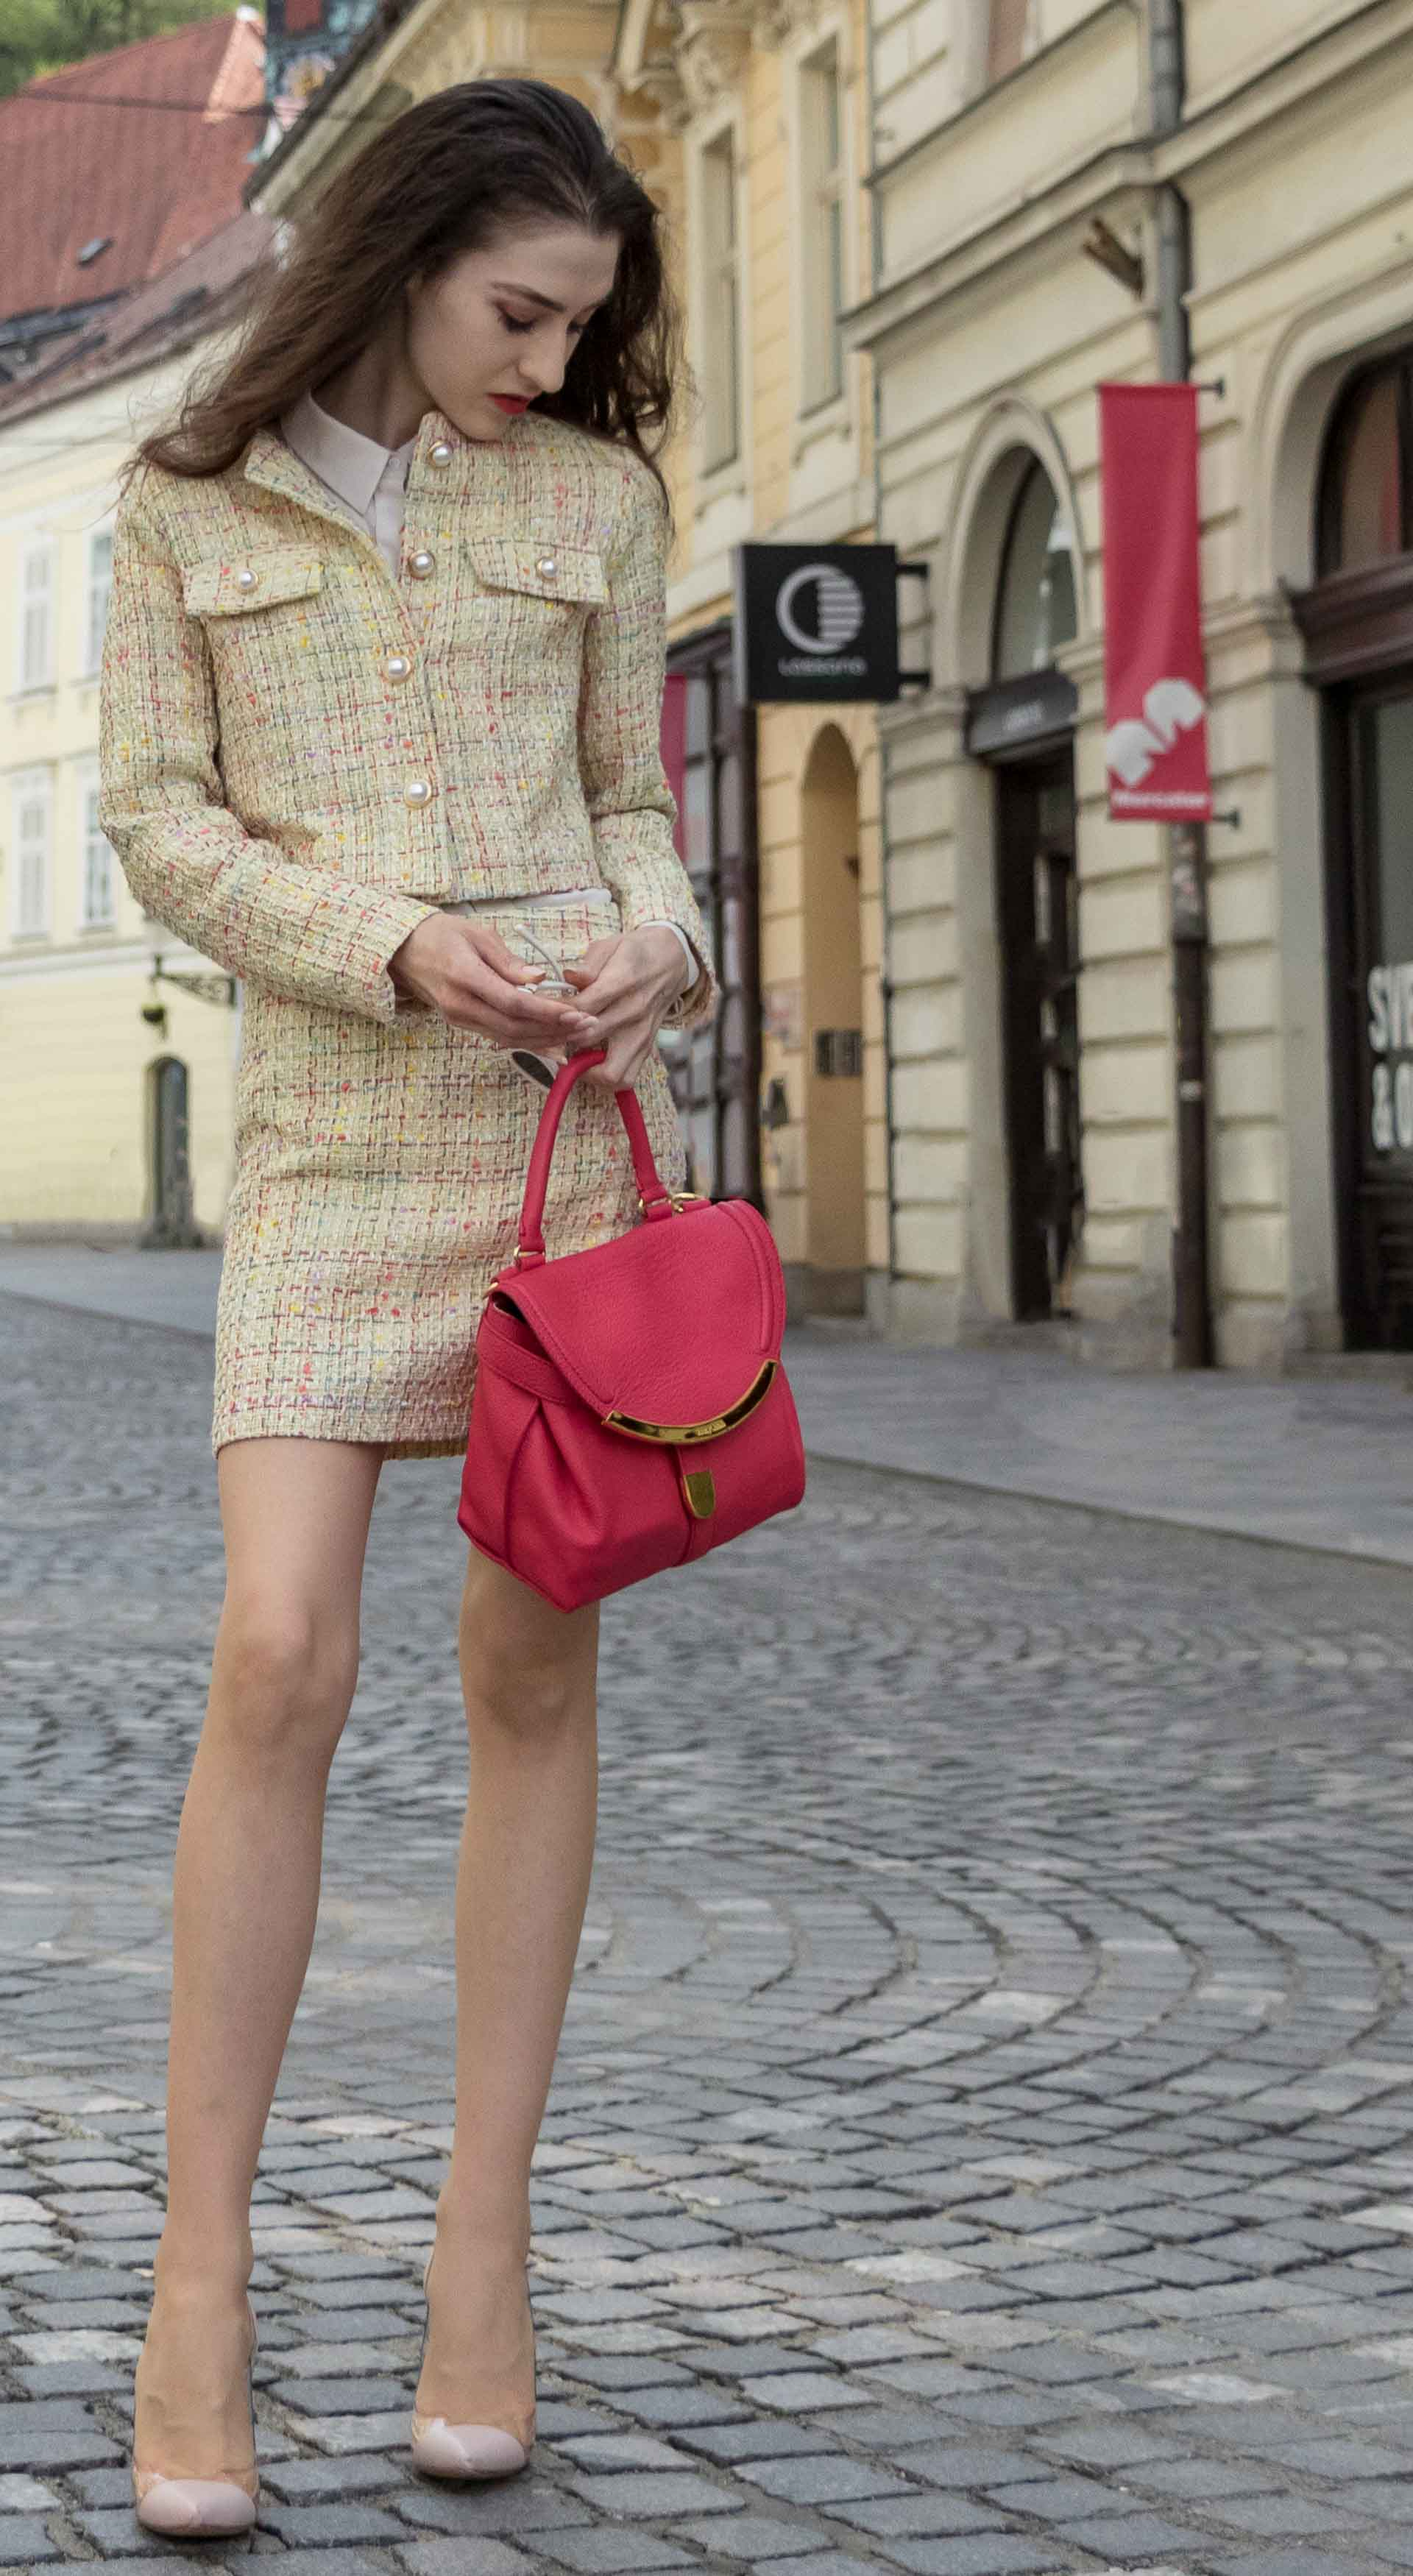 Yellow-tweed-mini-skirt-suit-chanel-look-spring-summer-street-style.jpg